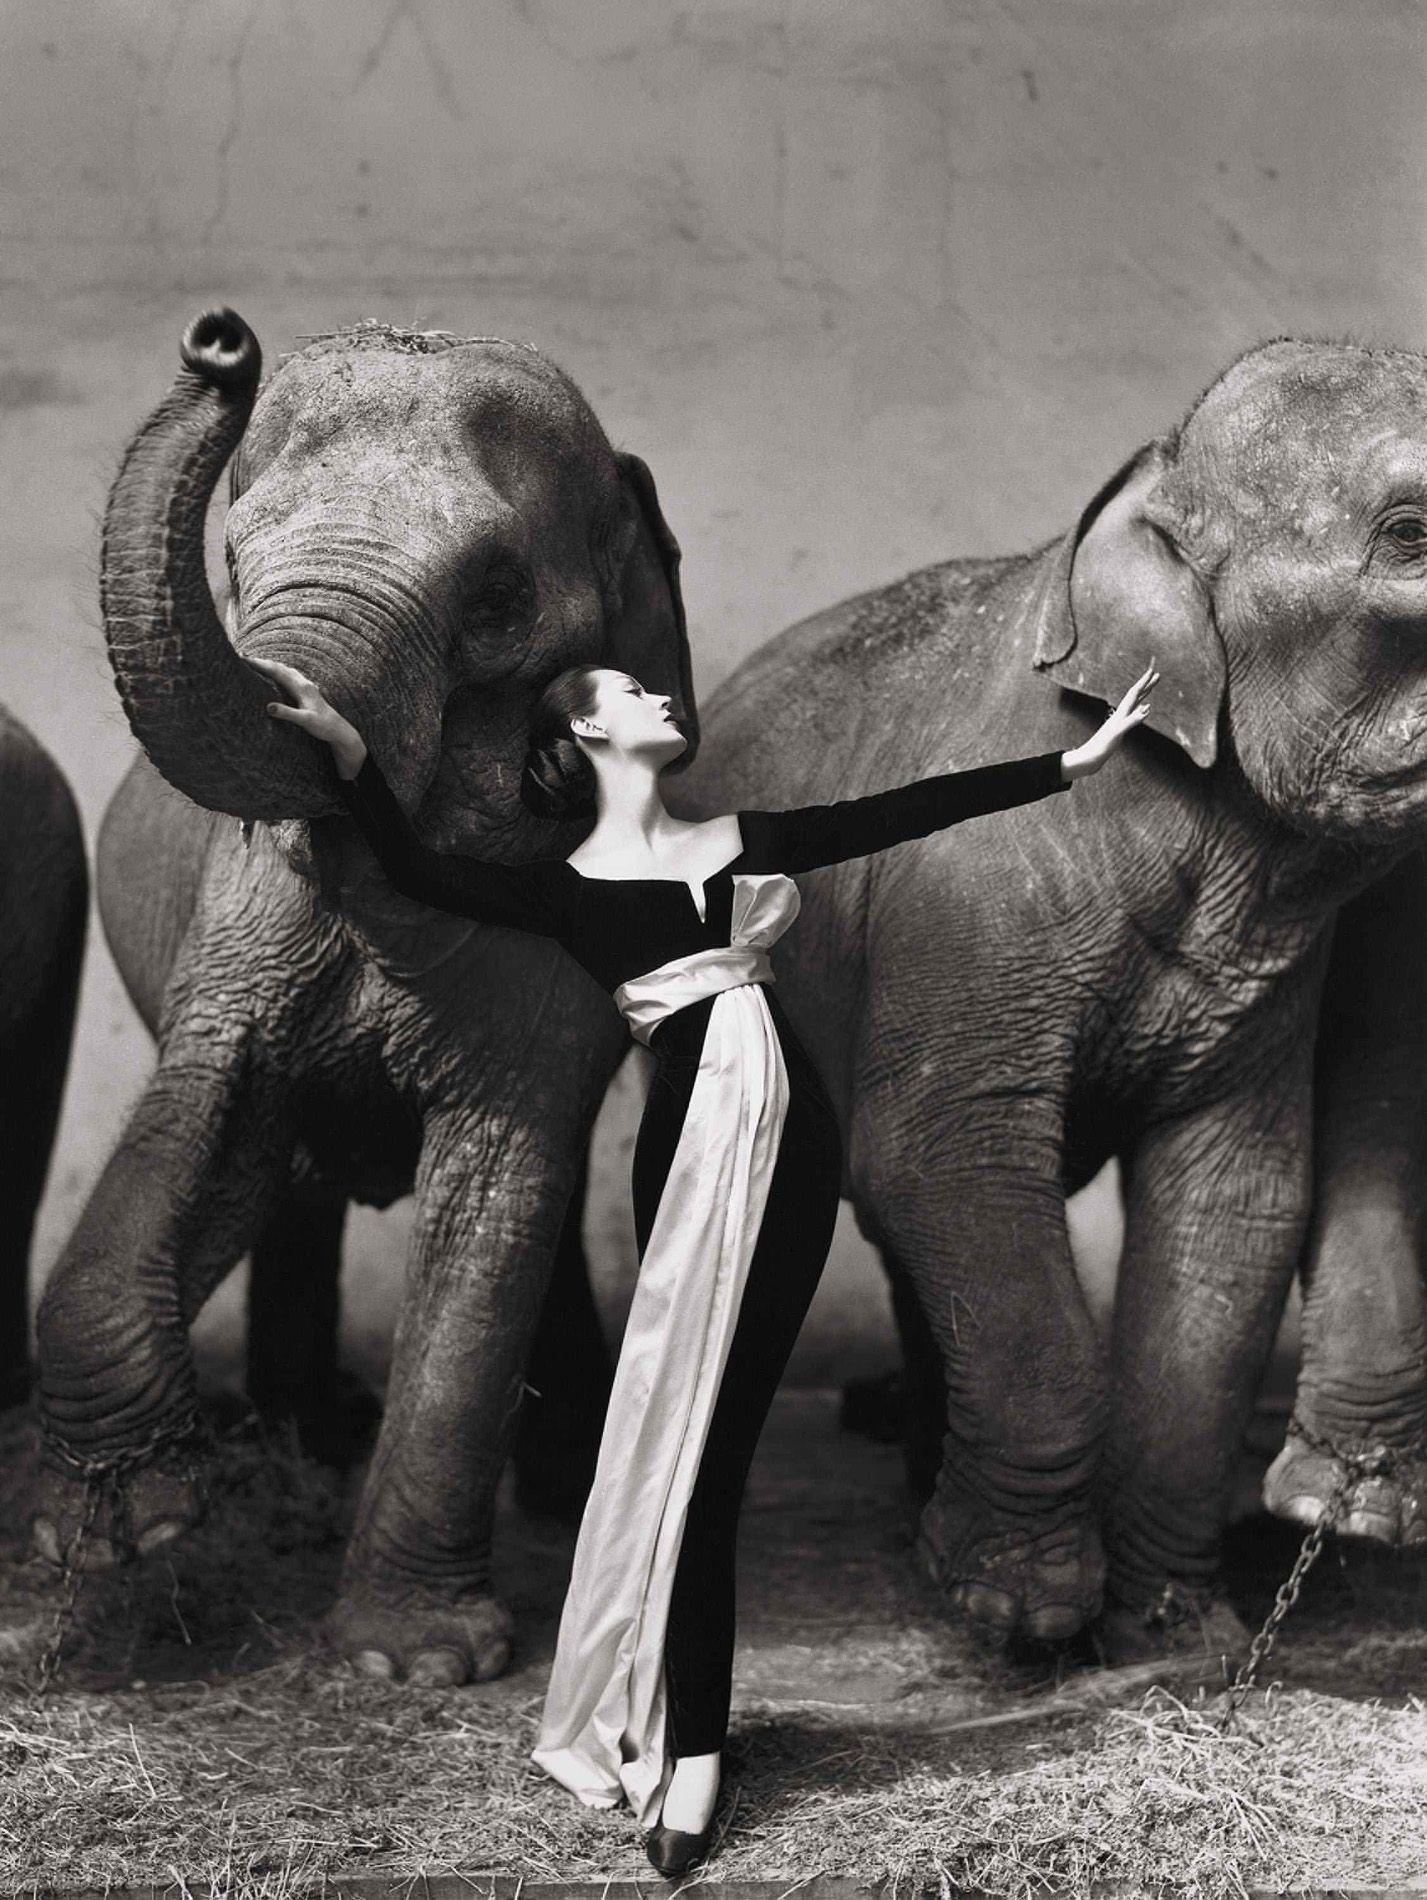 Dovima and the elephants by Richard Avedon for Harpers Bazaar, 1955